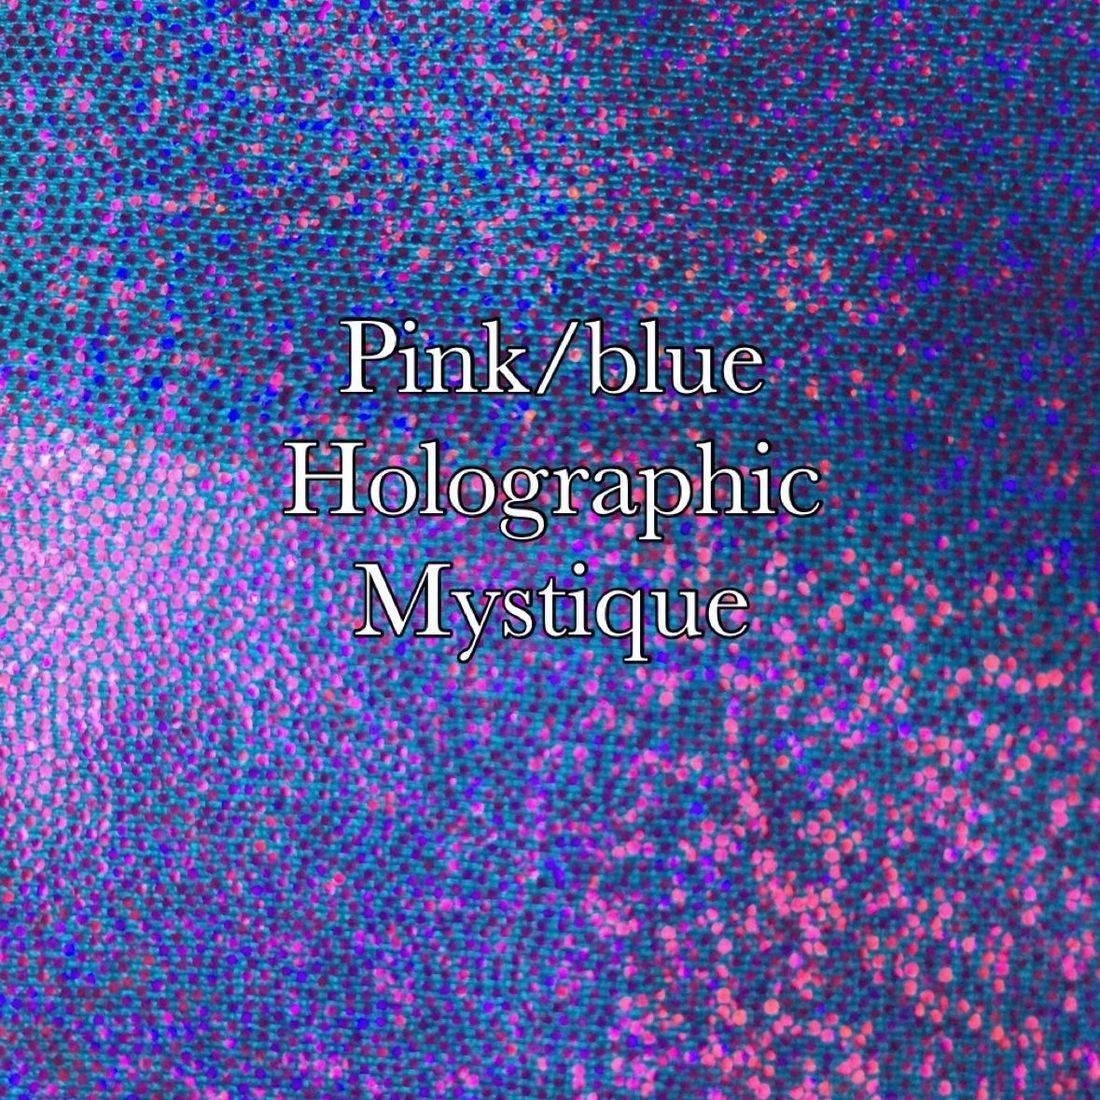 Pink blue holographic mist